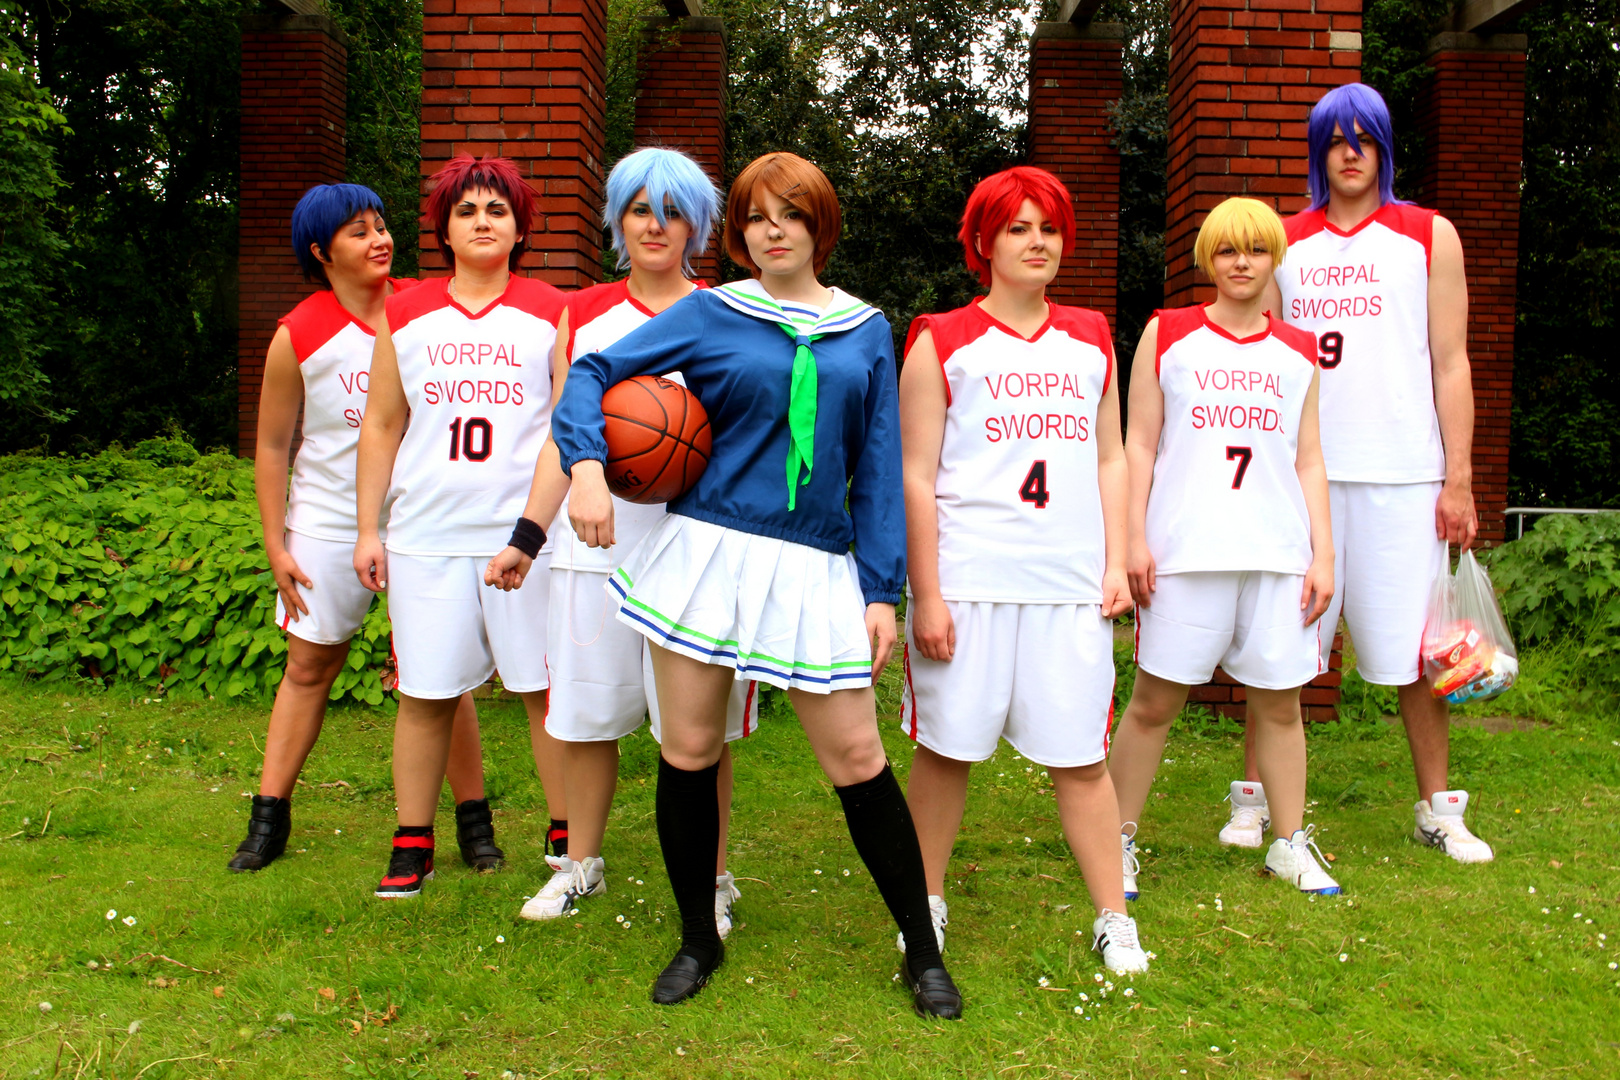 team vorpal swords kuroko no basuke foto bild szene cosplay